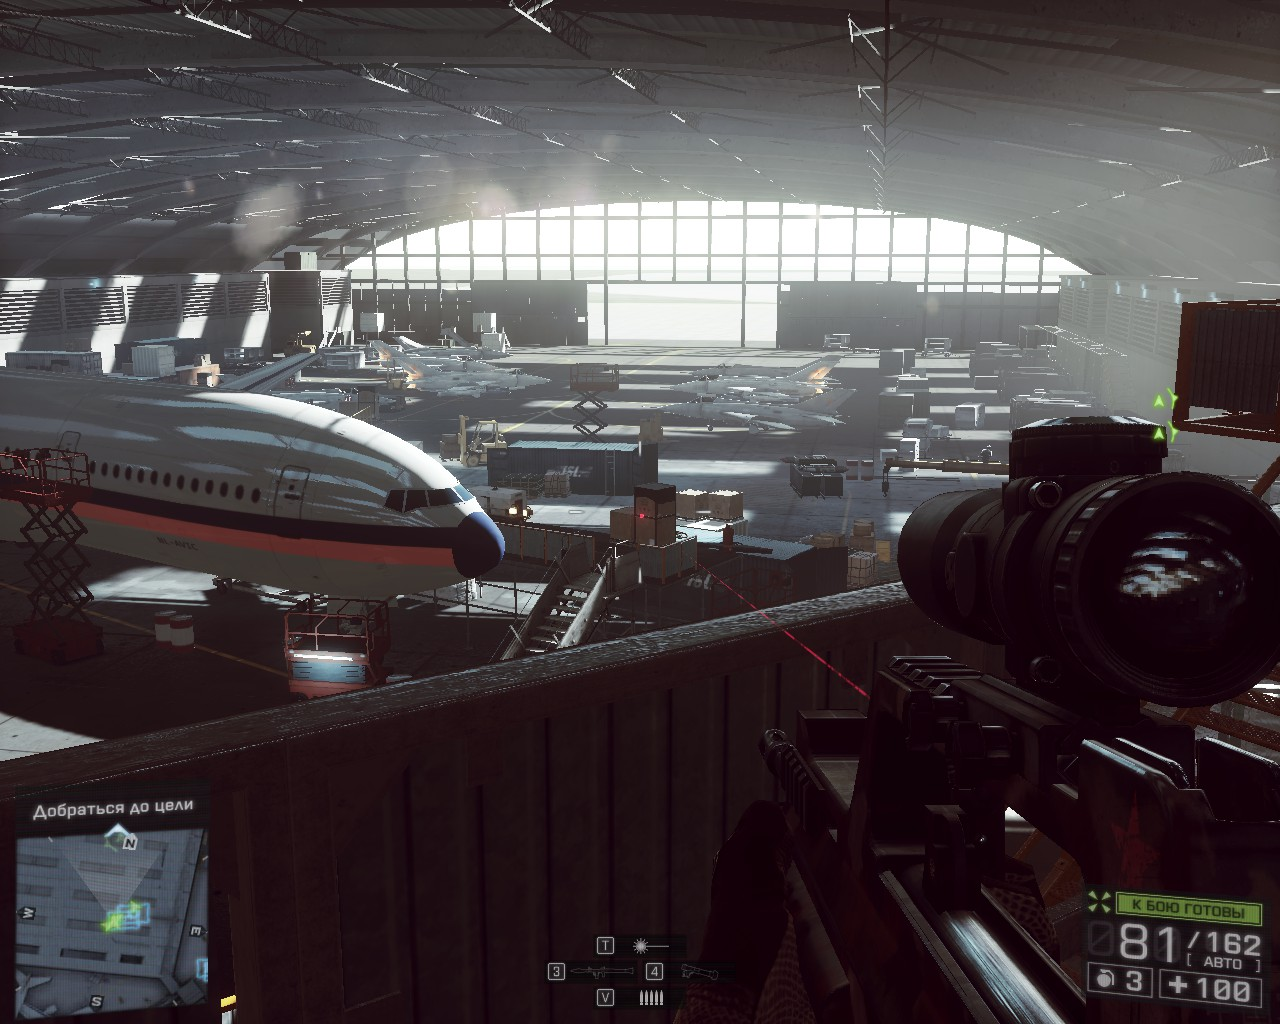 bf4 2014-04-05 01-46-52-36.jpg - Battlefield 4